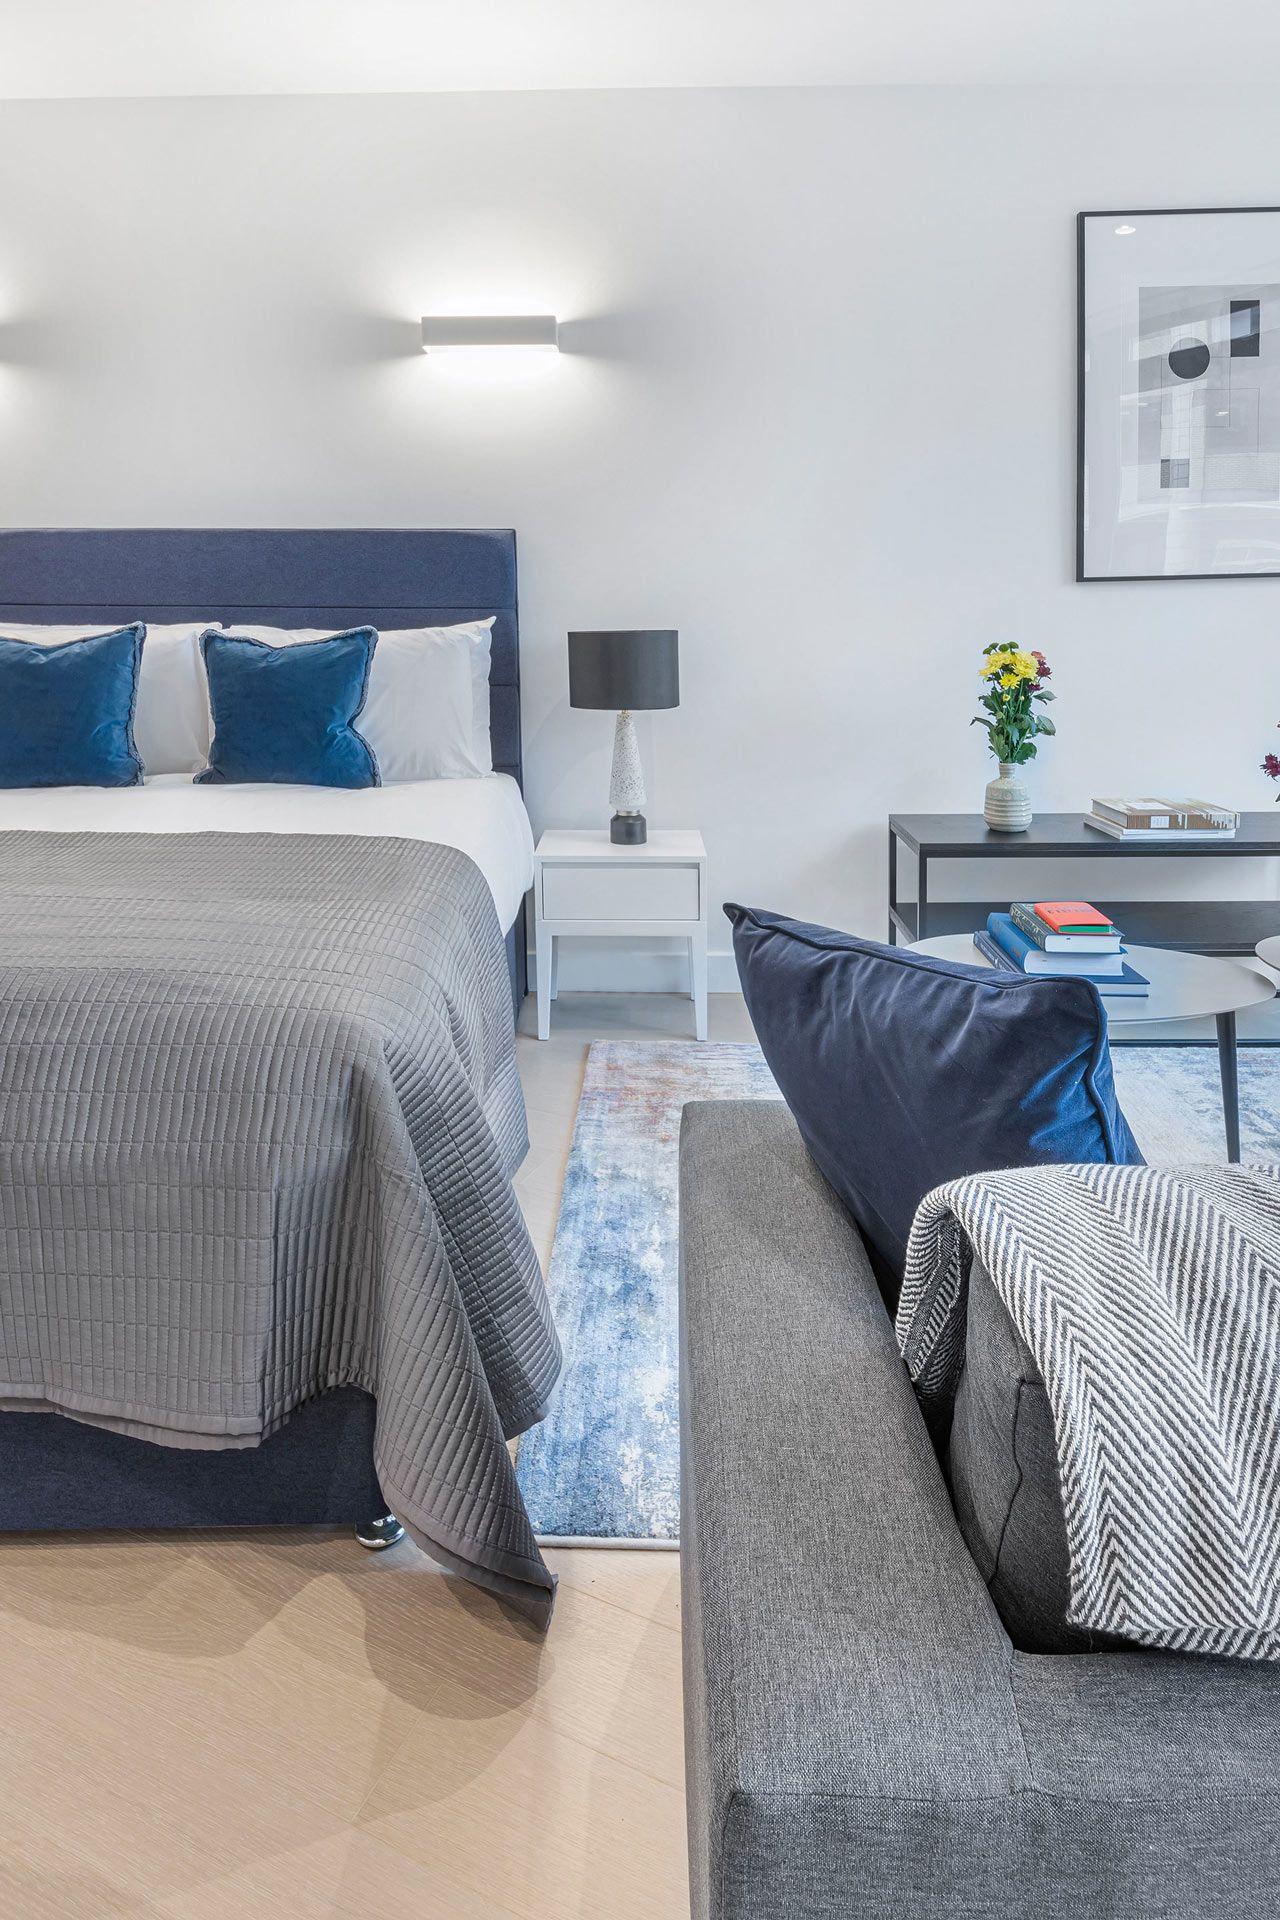 Studio apartment to rent in London SKI-VH-0011